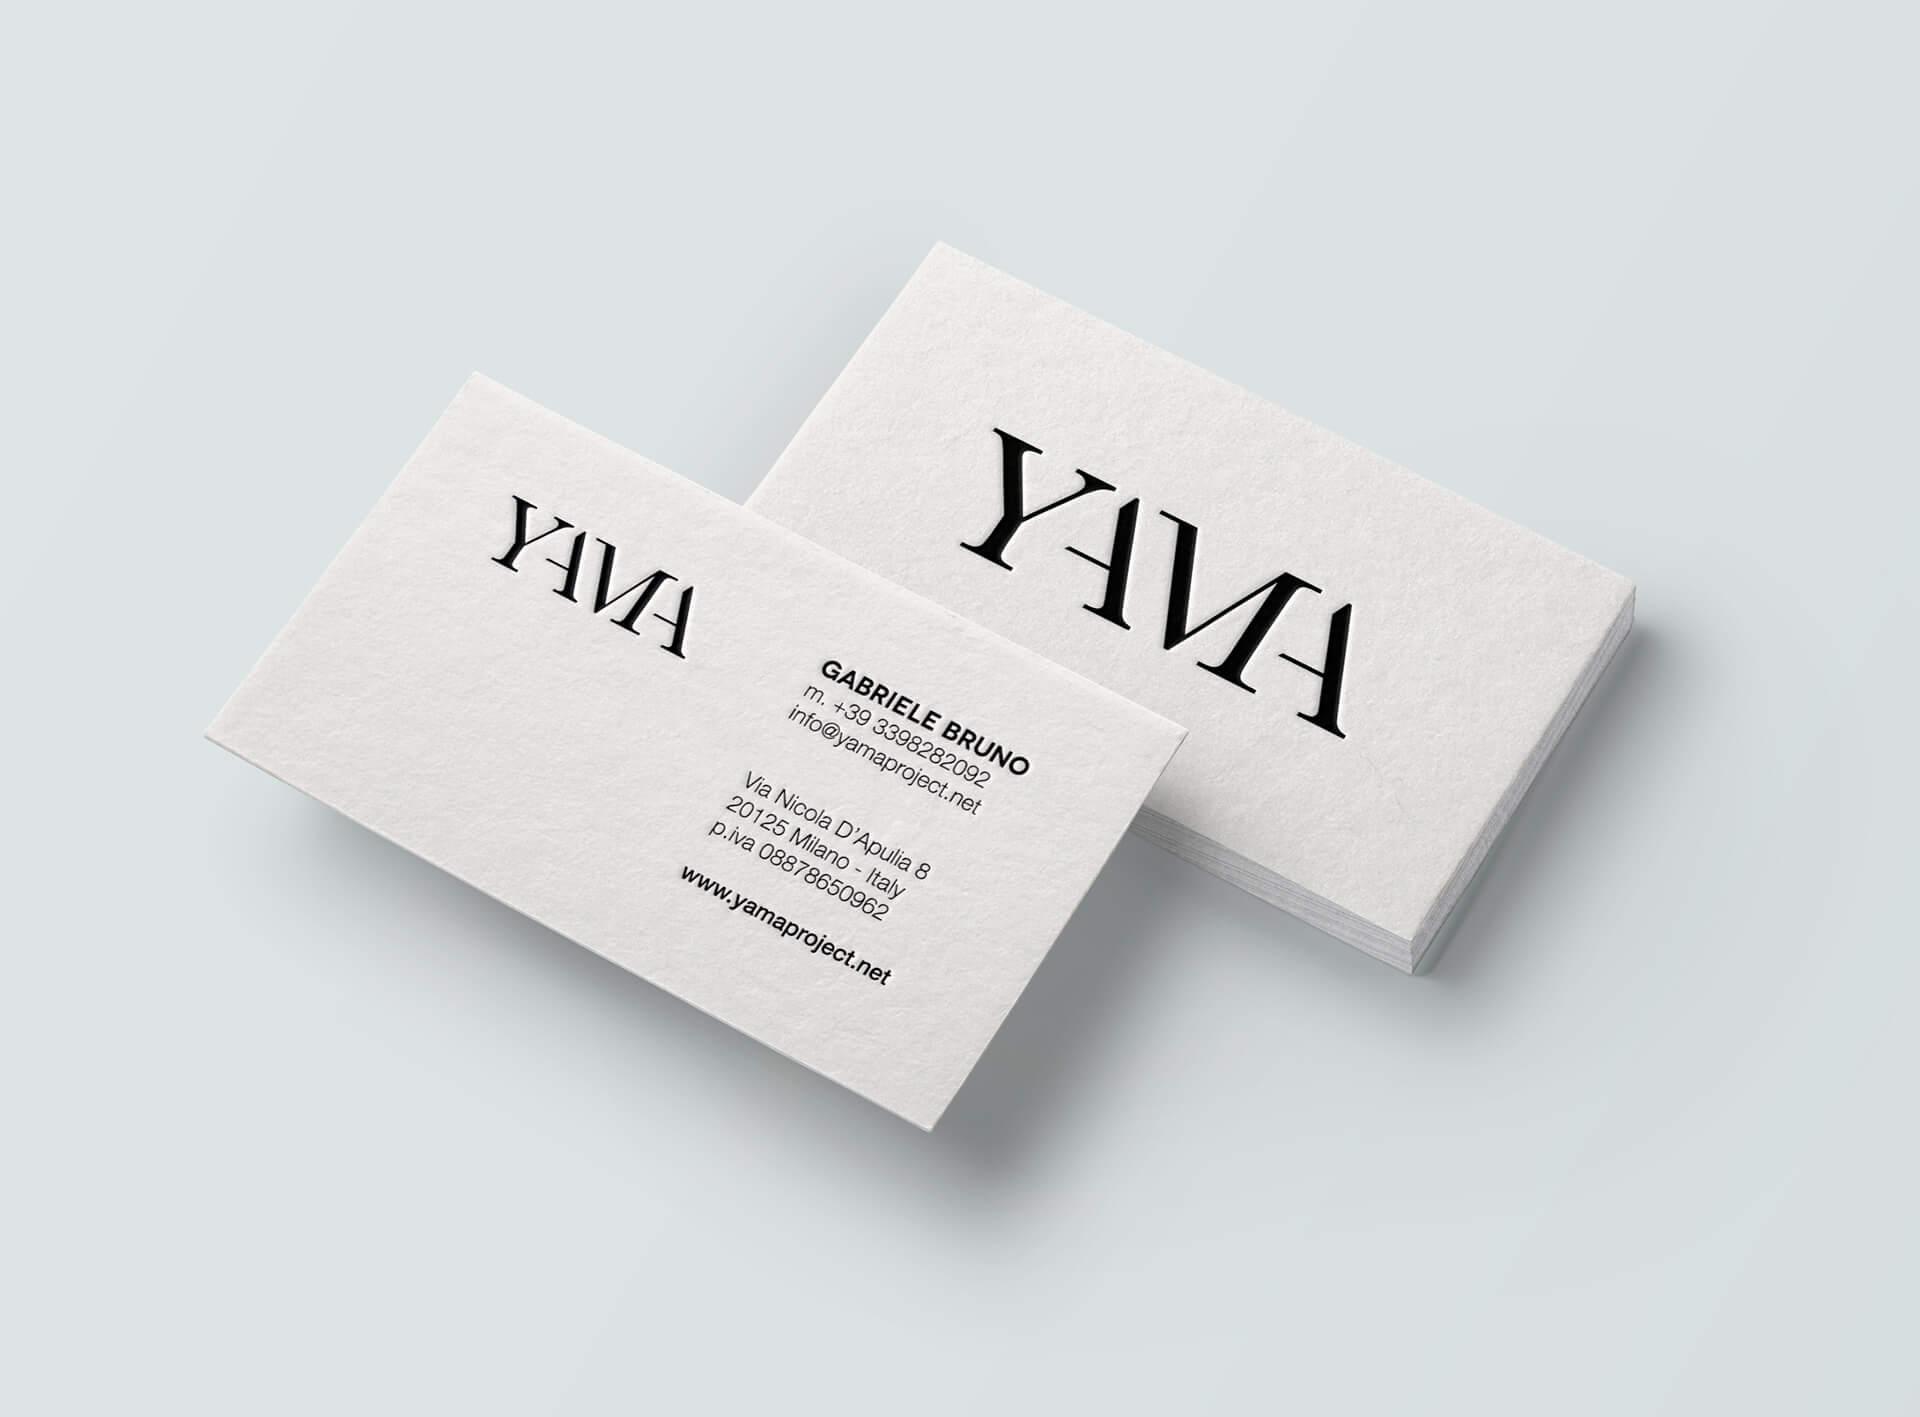 yama corporate image